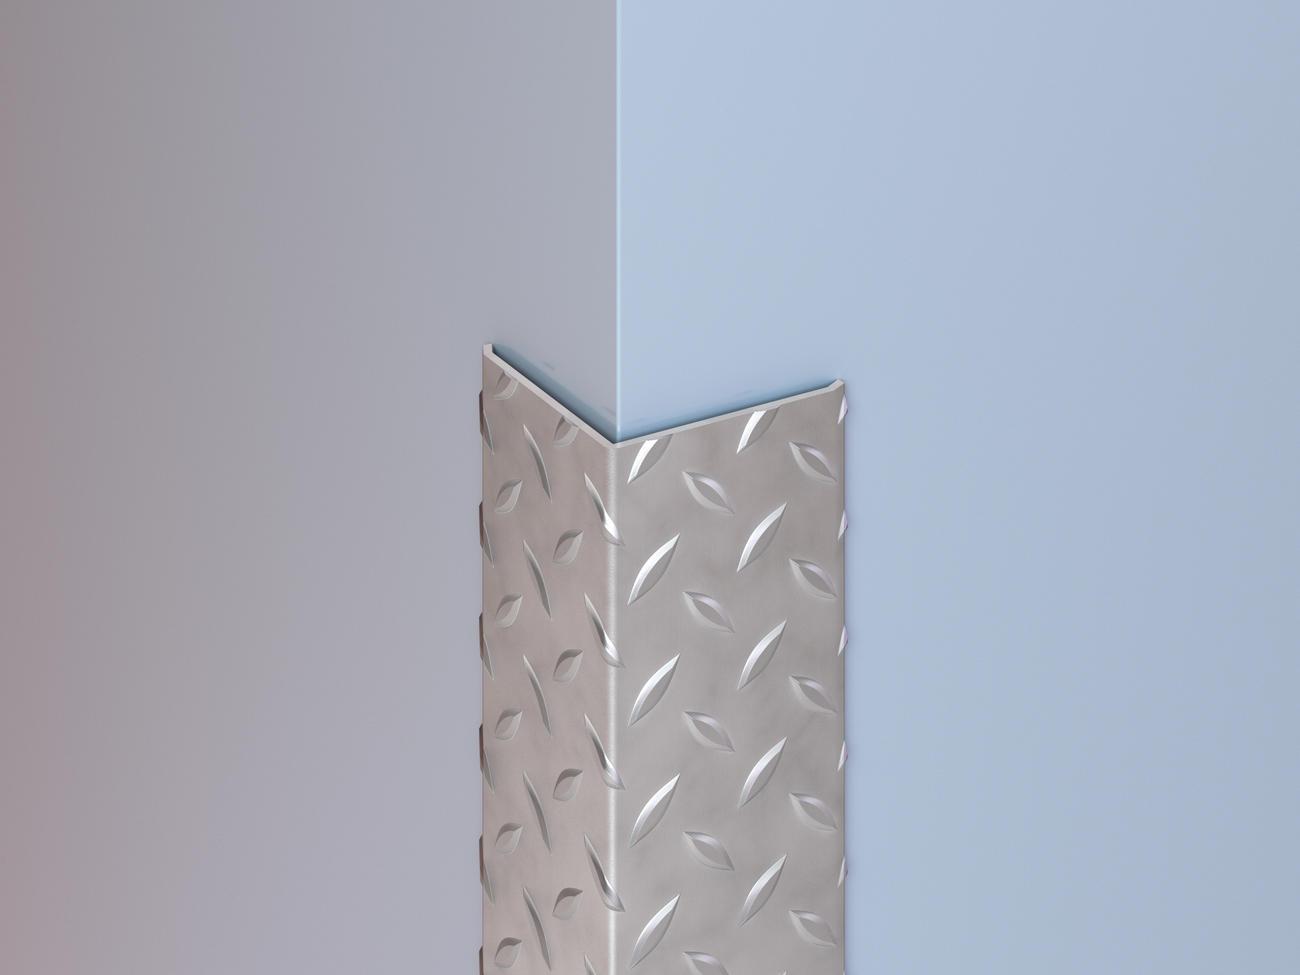 Stainless Steel Diamond Plate Corner Guards